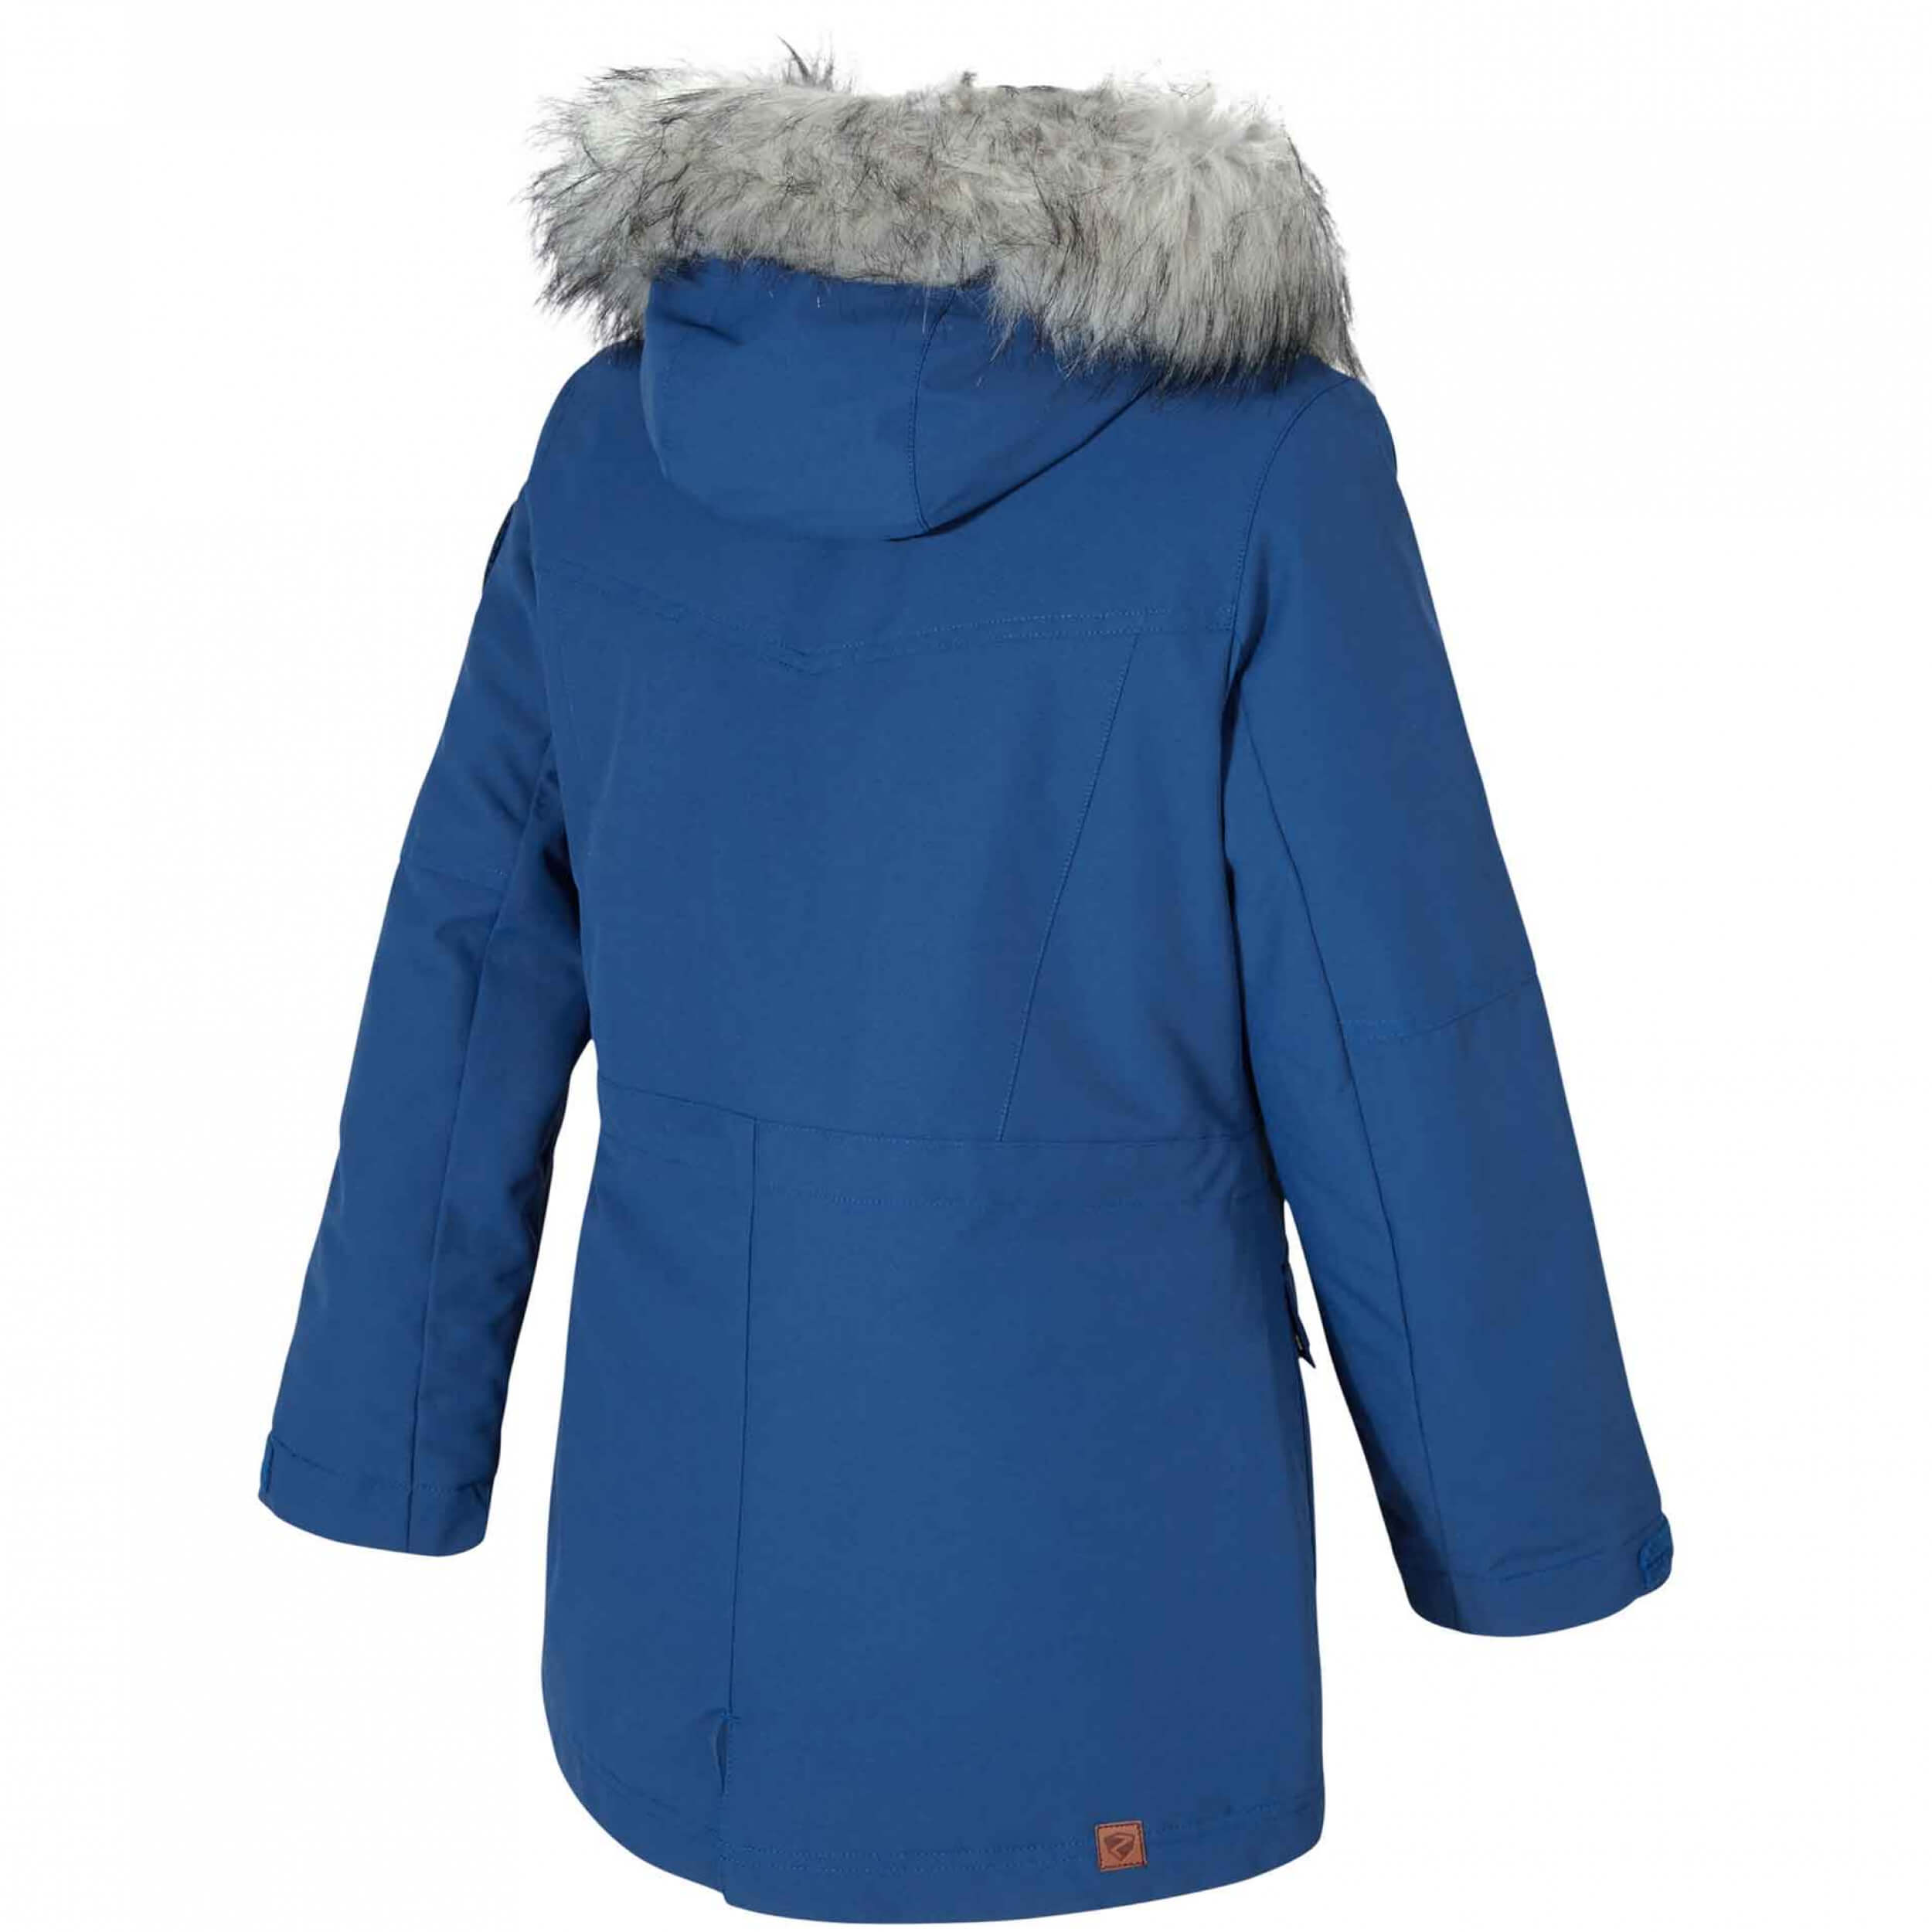 ZIENER Kinder Skijacke Amarla AQUASHIELD blau 204